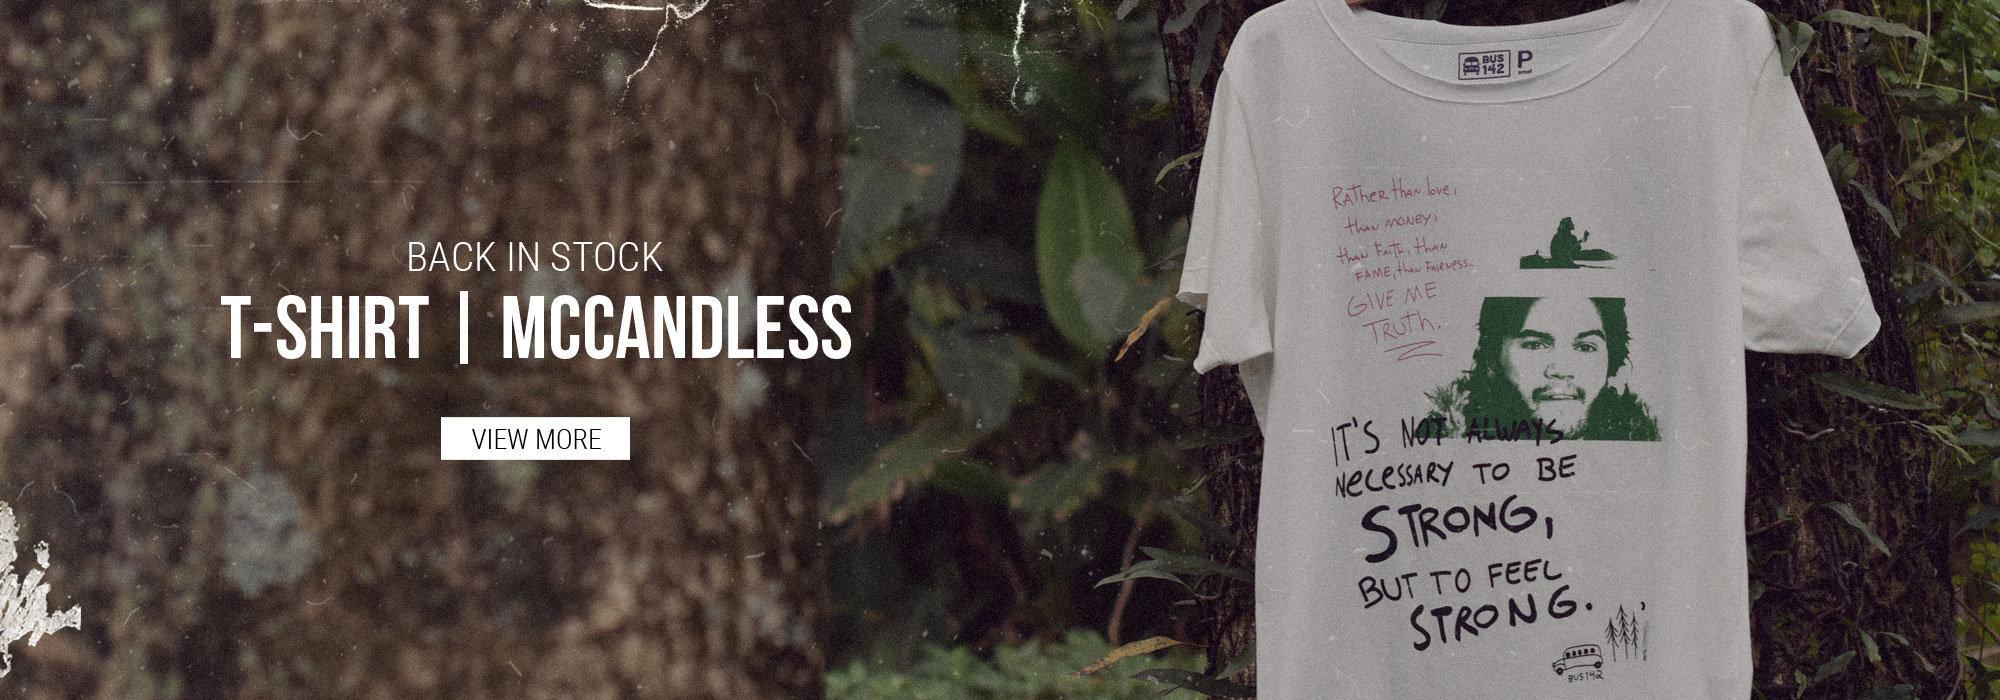 banner mccandless